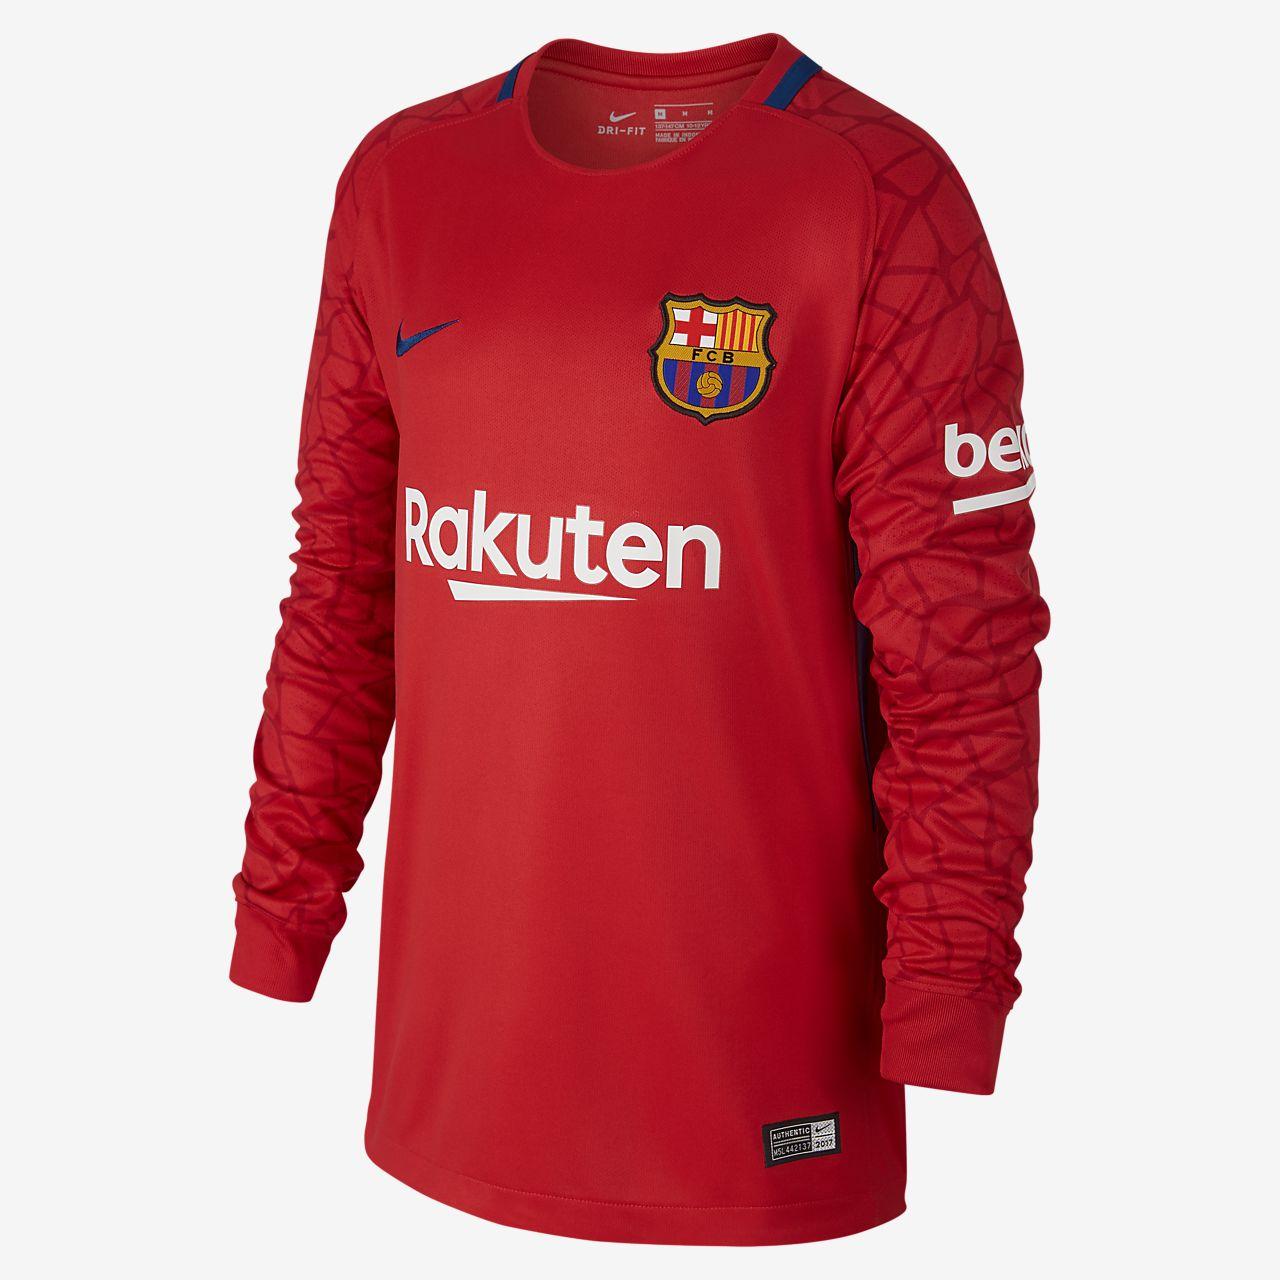 new style b04ec fdc69 fc barcelona football jersey